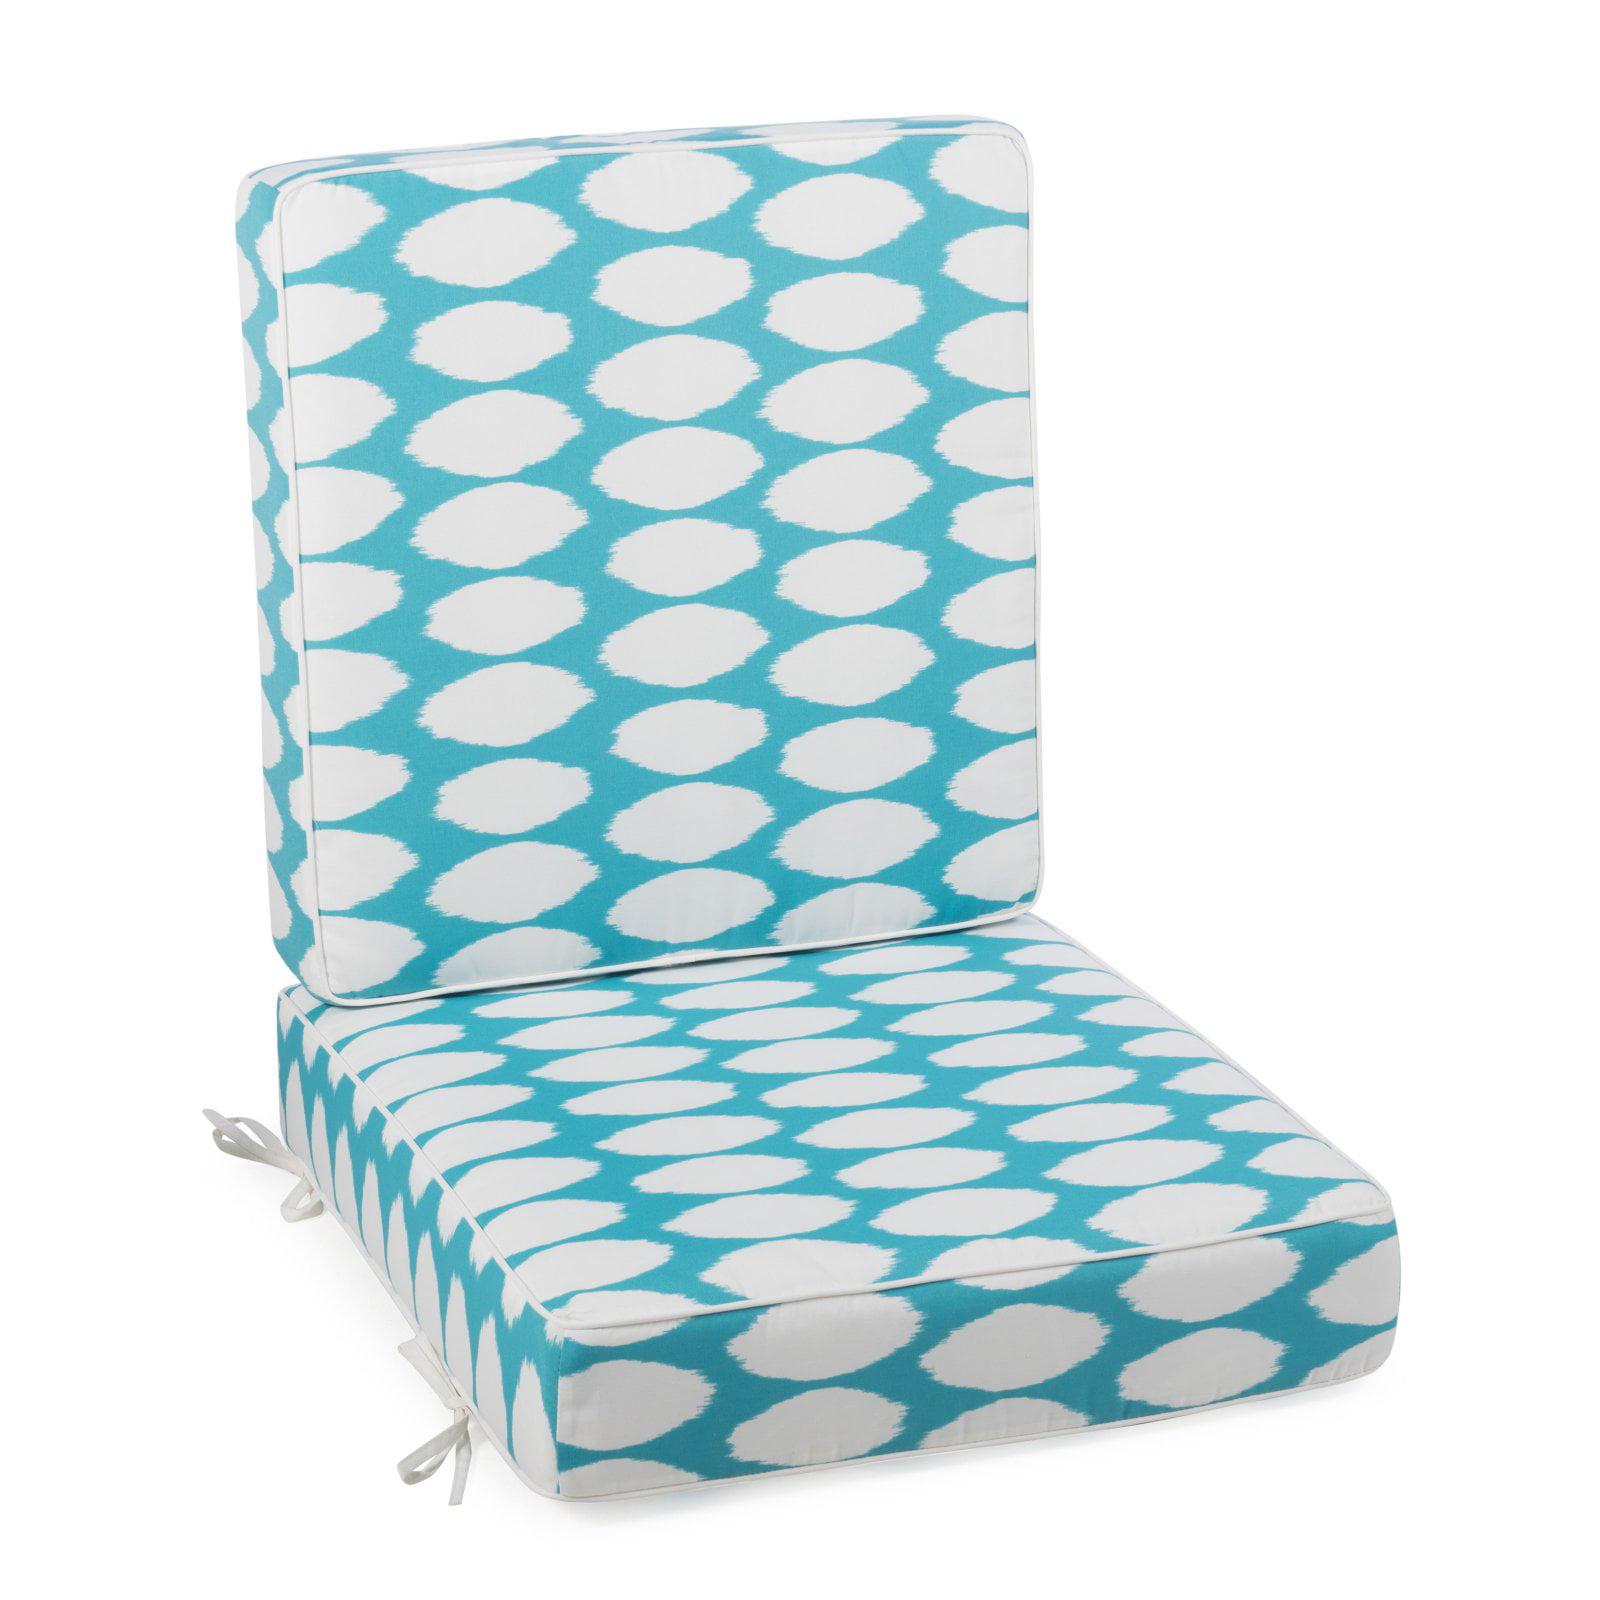 Coral Coast Lakeside Hinged Outdoor Deep Seating Cushion by Alfred Zahn Ltd